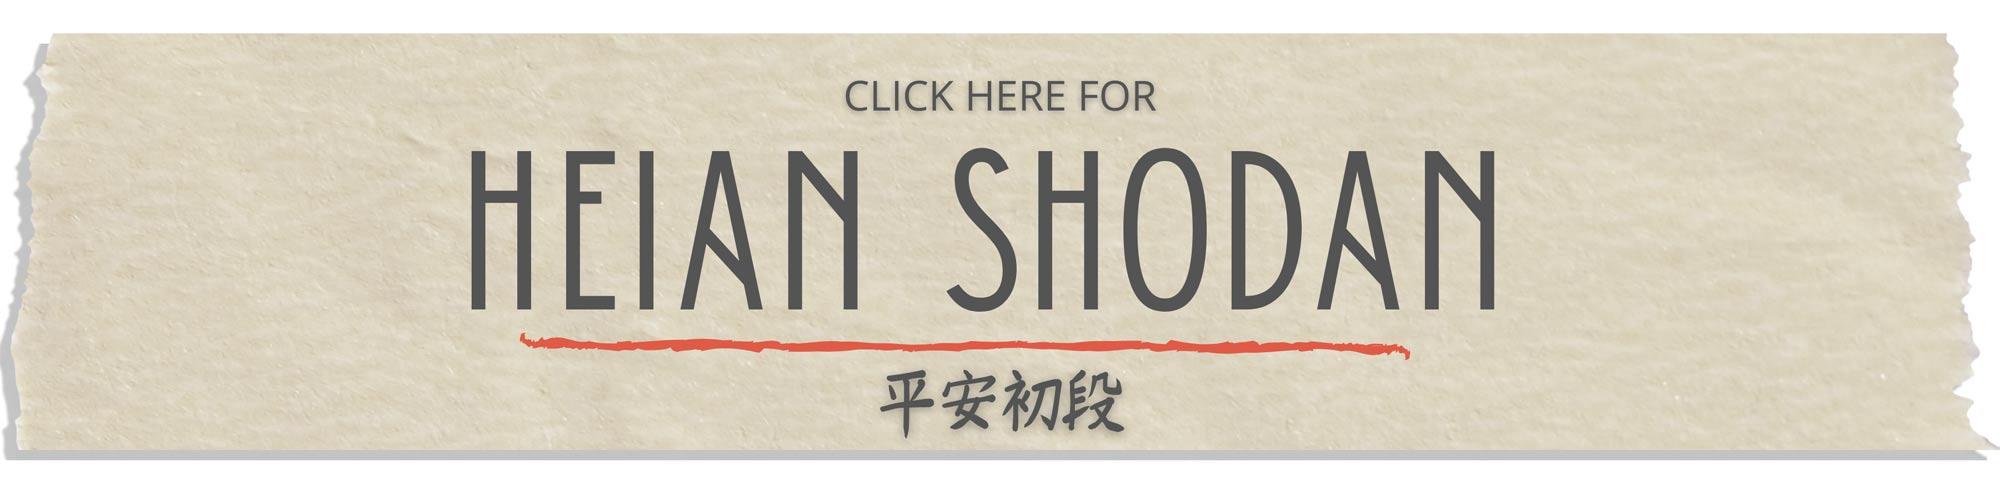 heian shodan step by step